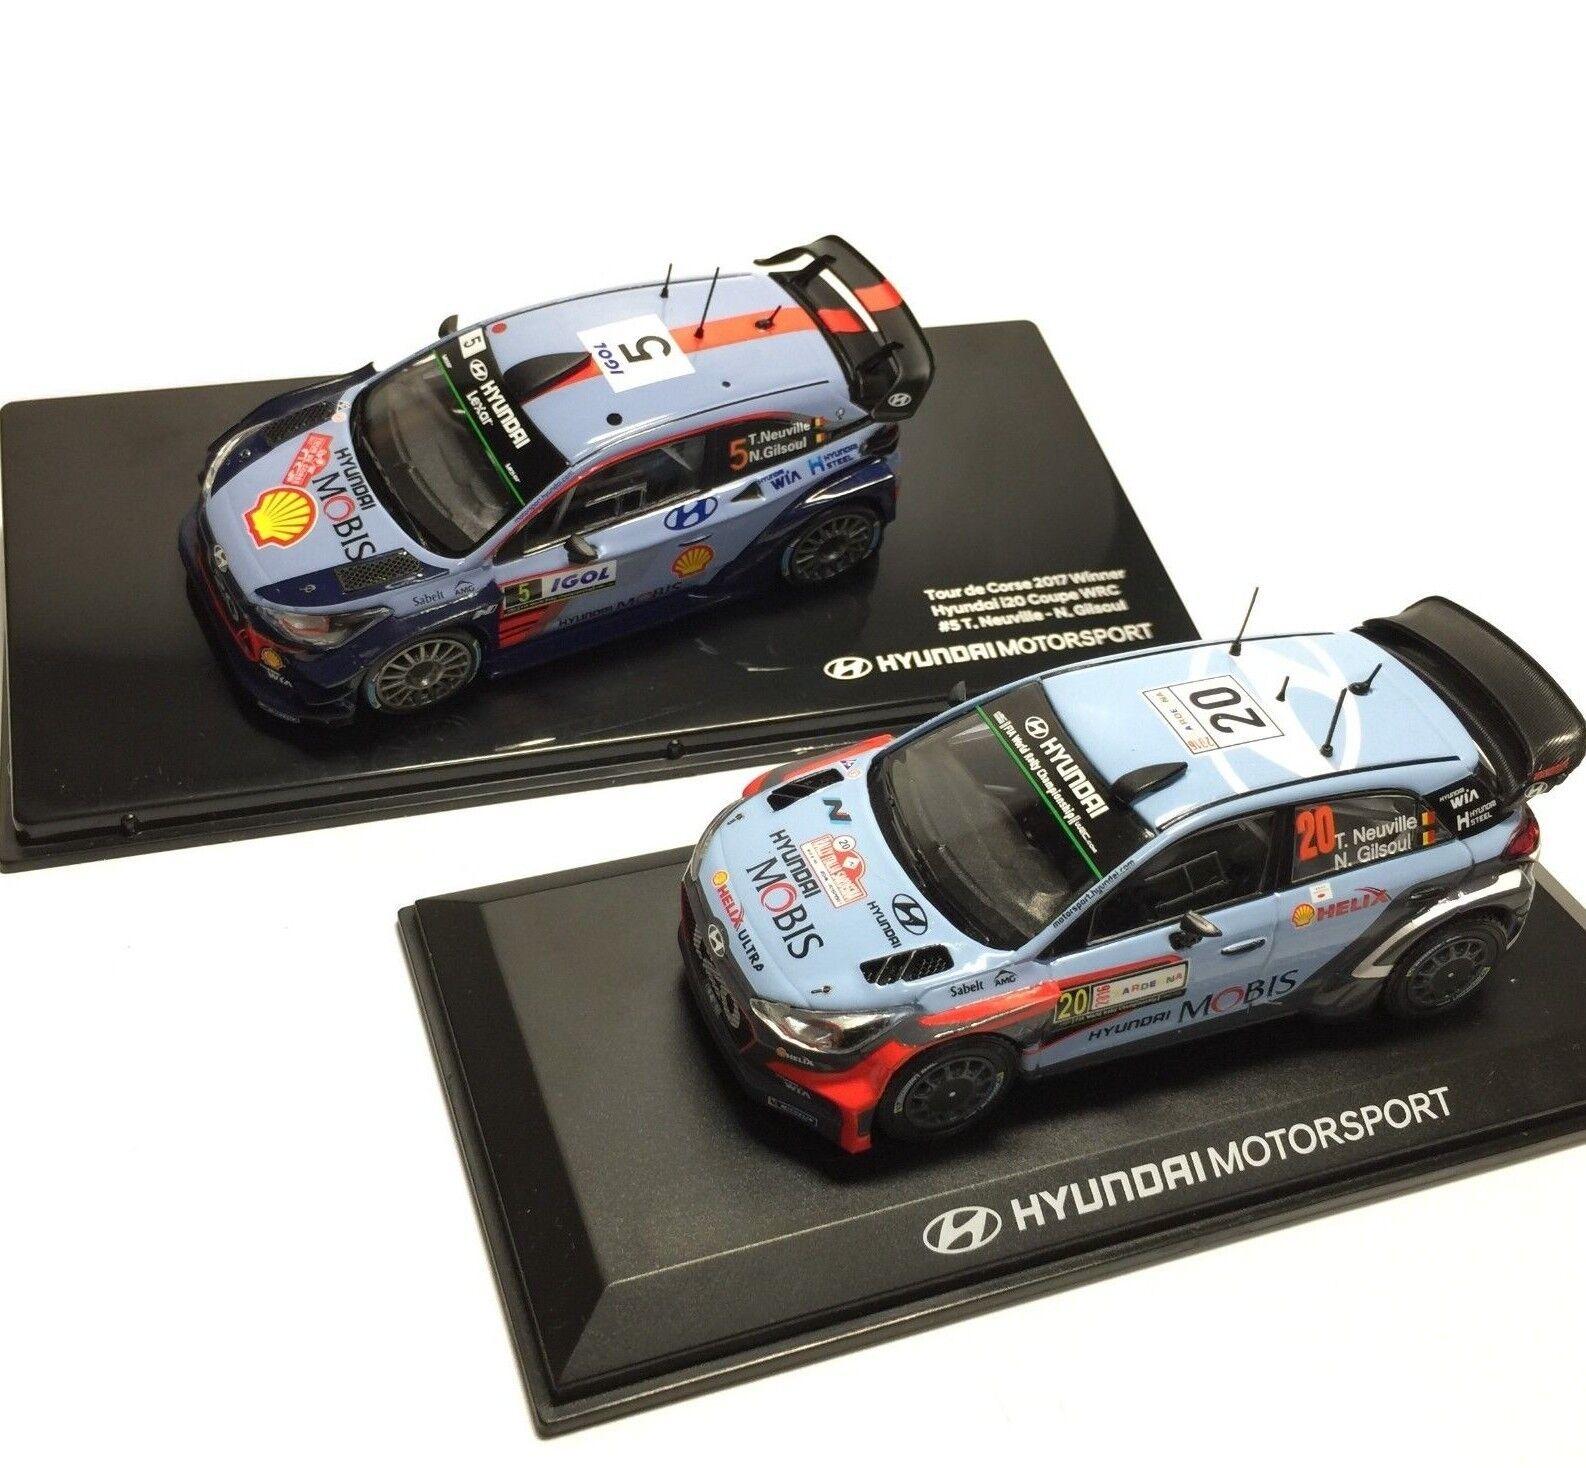 Hyundai i20 Coupe wrc 1 43 rally winner 2016 1ea, 2017 1ea-Thierry Neuville